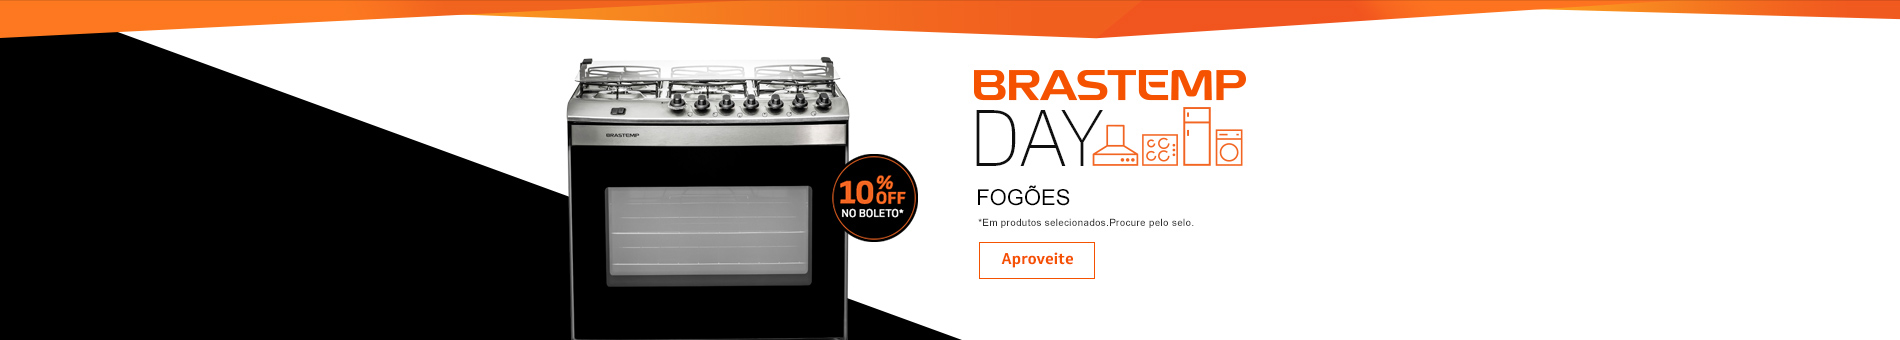 Promoção Interna - 1186 - brastempday_fogoes_2122016_home3 - fogoes - 3